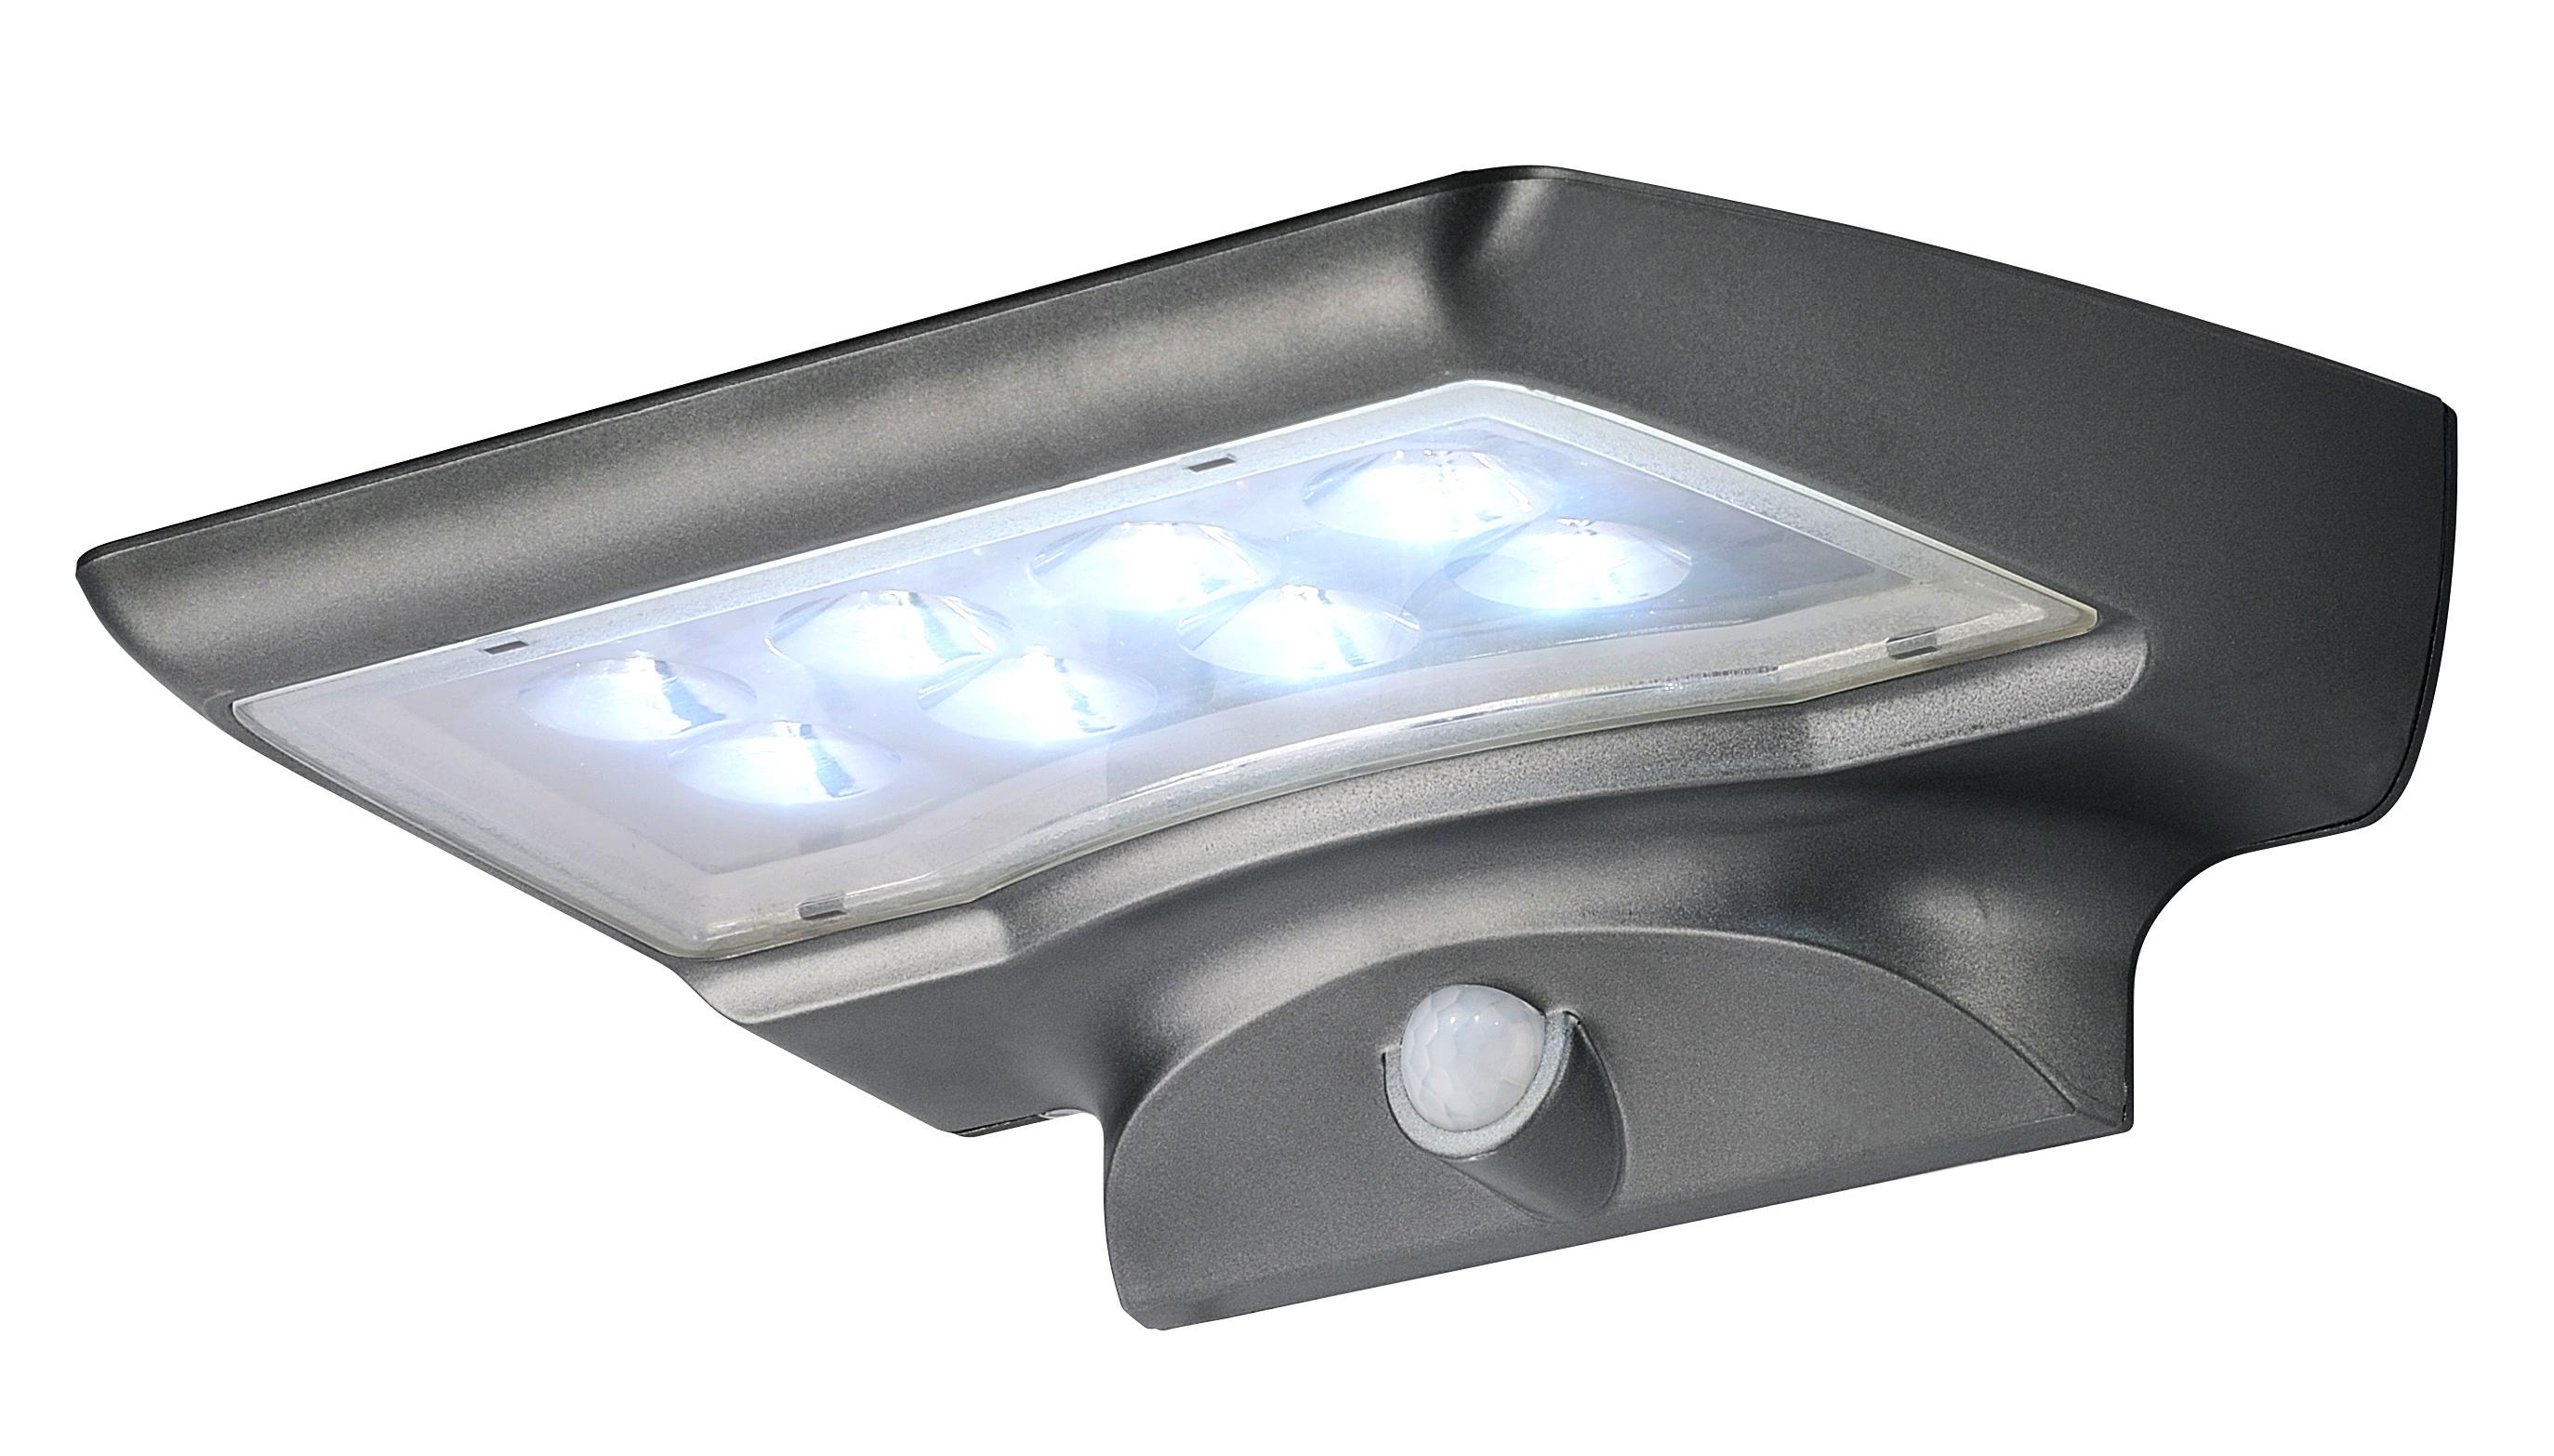 solar led gartenbeleuchtung mit bewegungsmelder solar au enbeleuchtung au enleuc 4041908098610. Black Bedroom Furniture Sets. Home Design Ideas